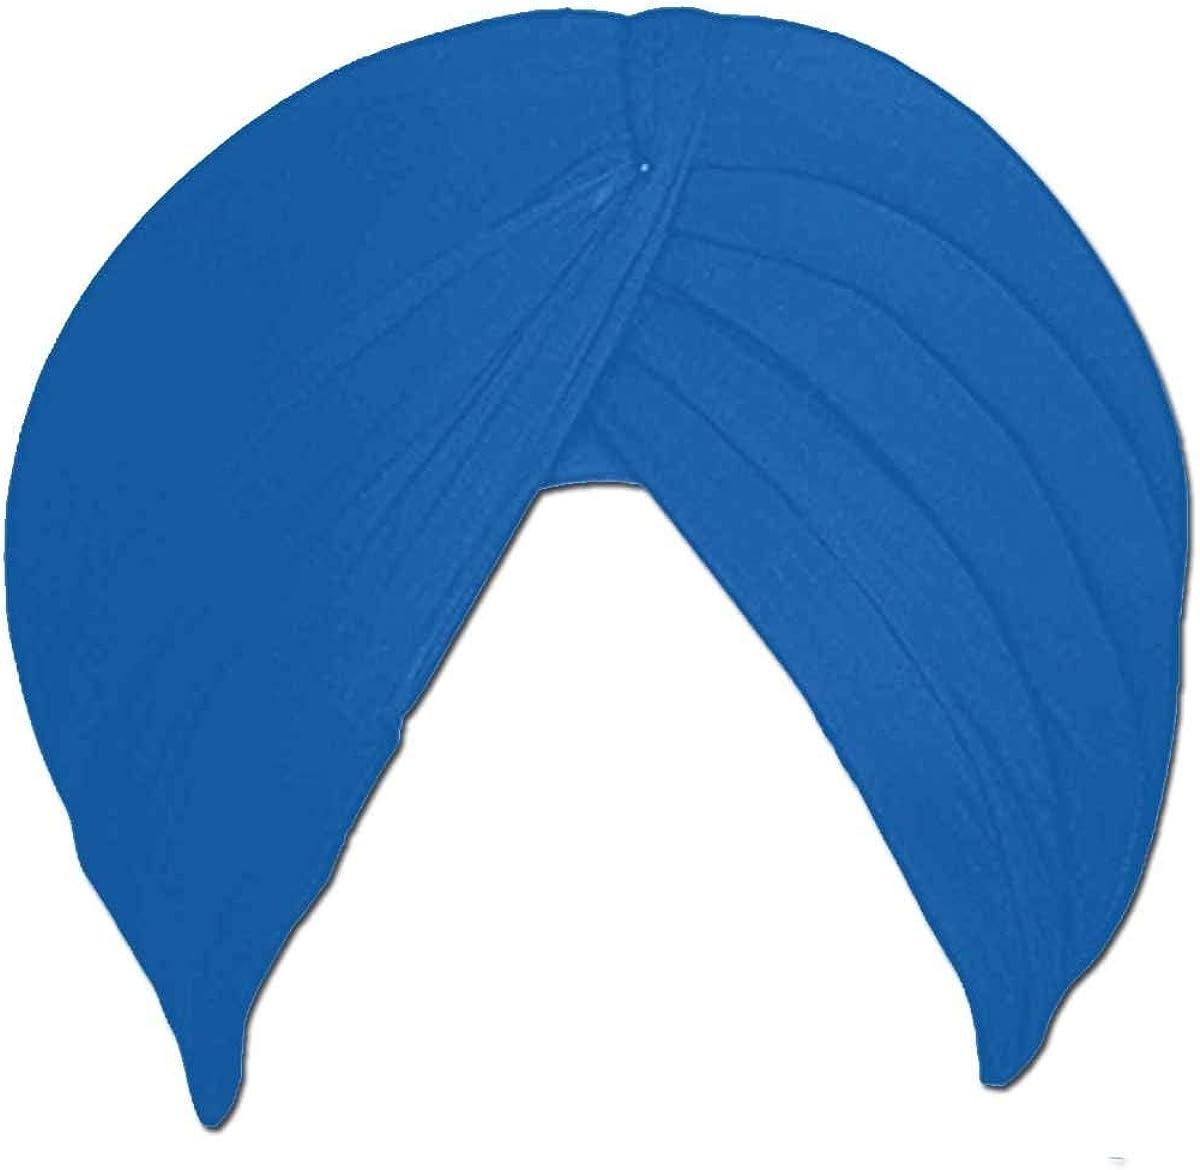 5 Meter Unstitched Double Punjabi Pagri Color Sikh Cotton Turban for Men